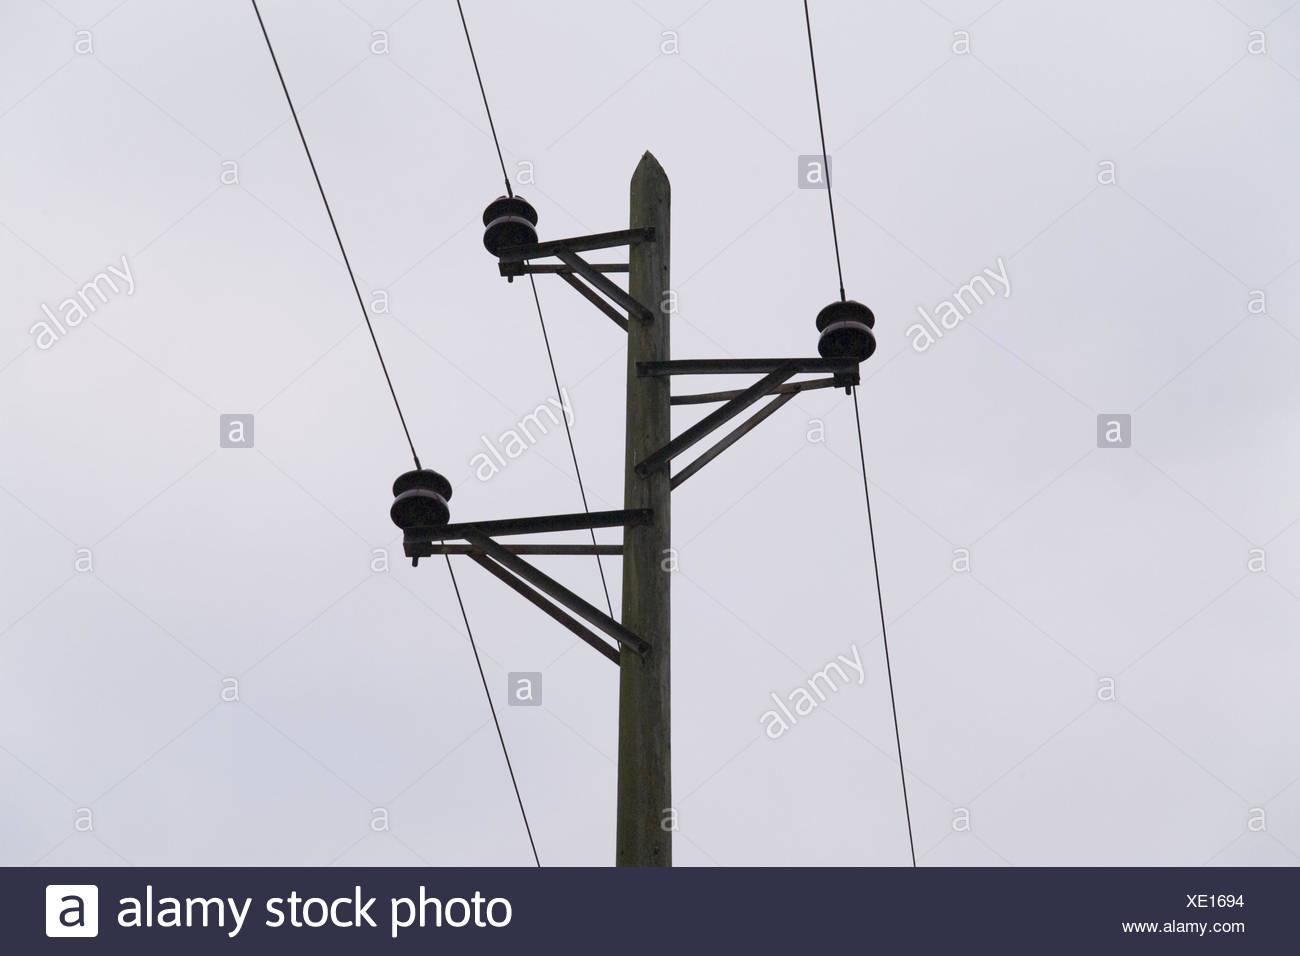 Wooden Power Poles Stock Photos & Wooden Power Poles Stock ...